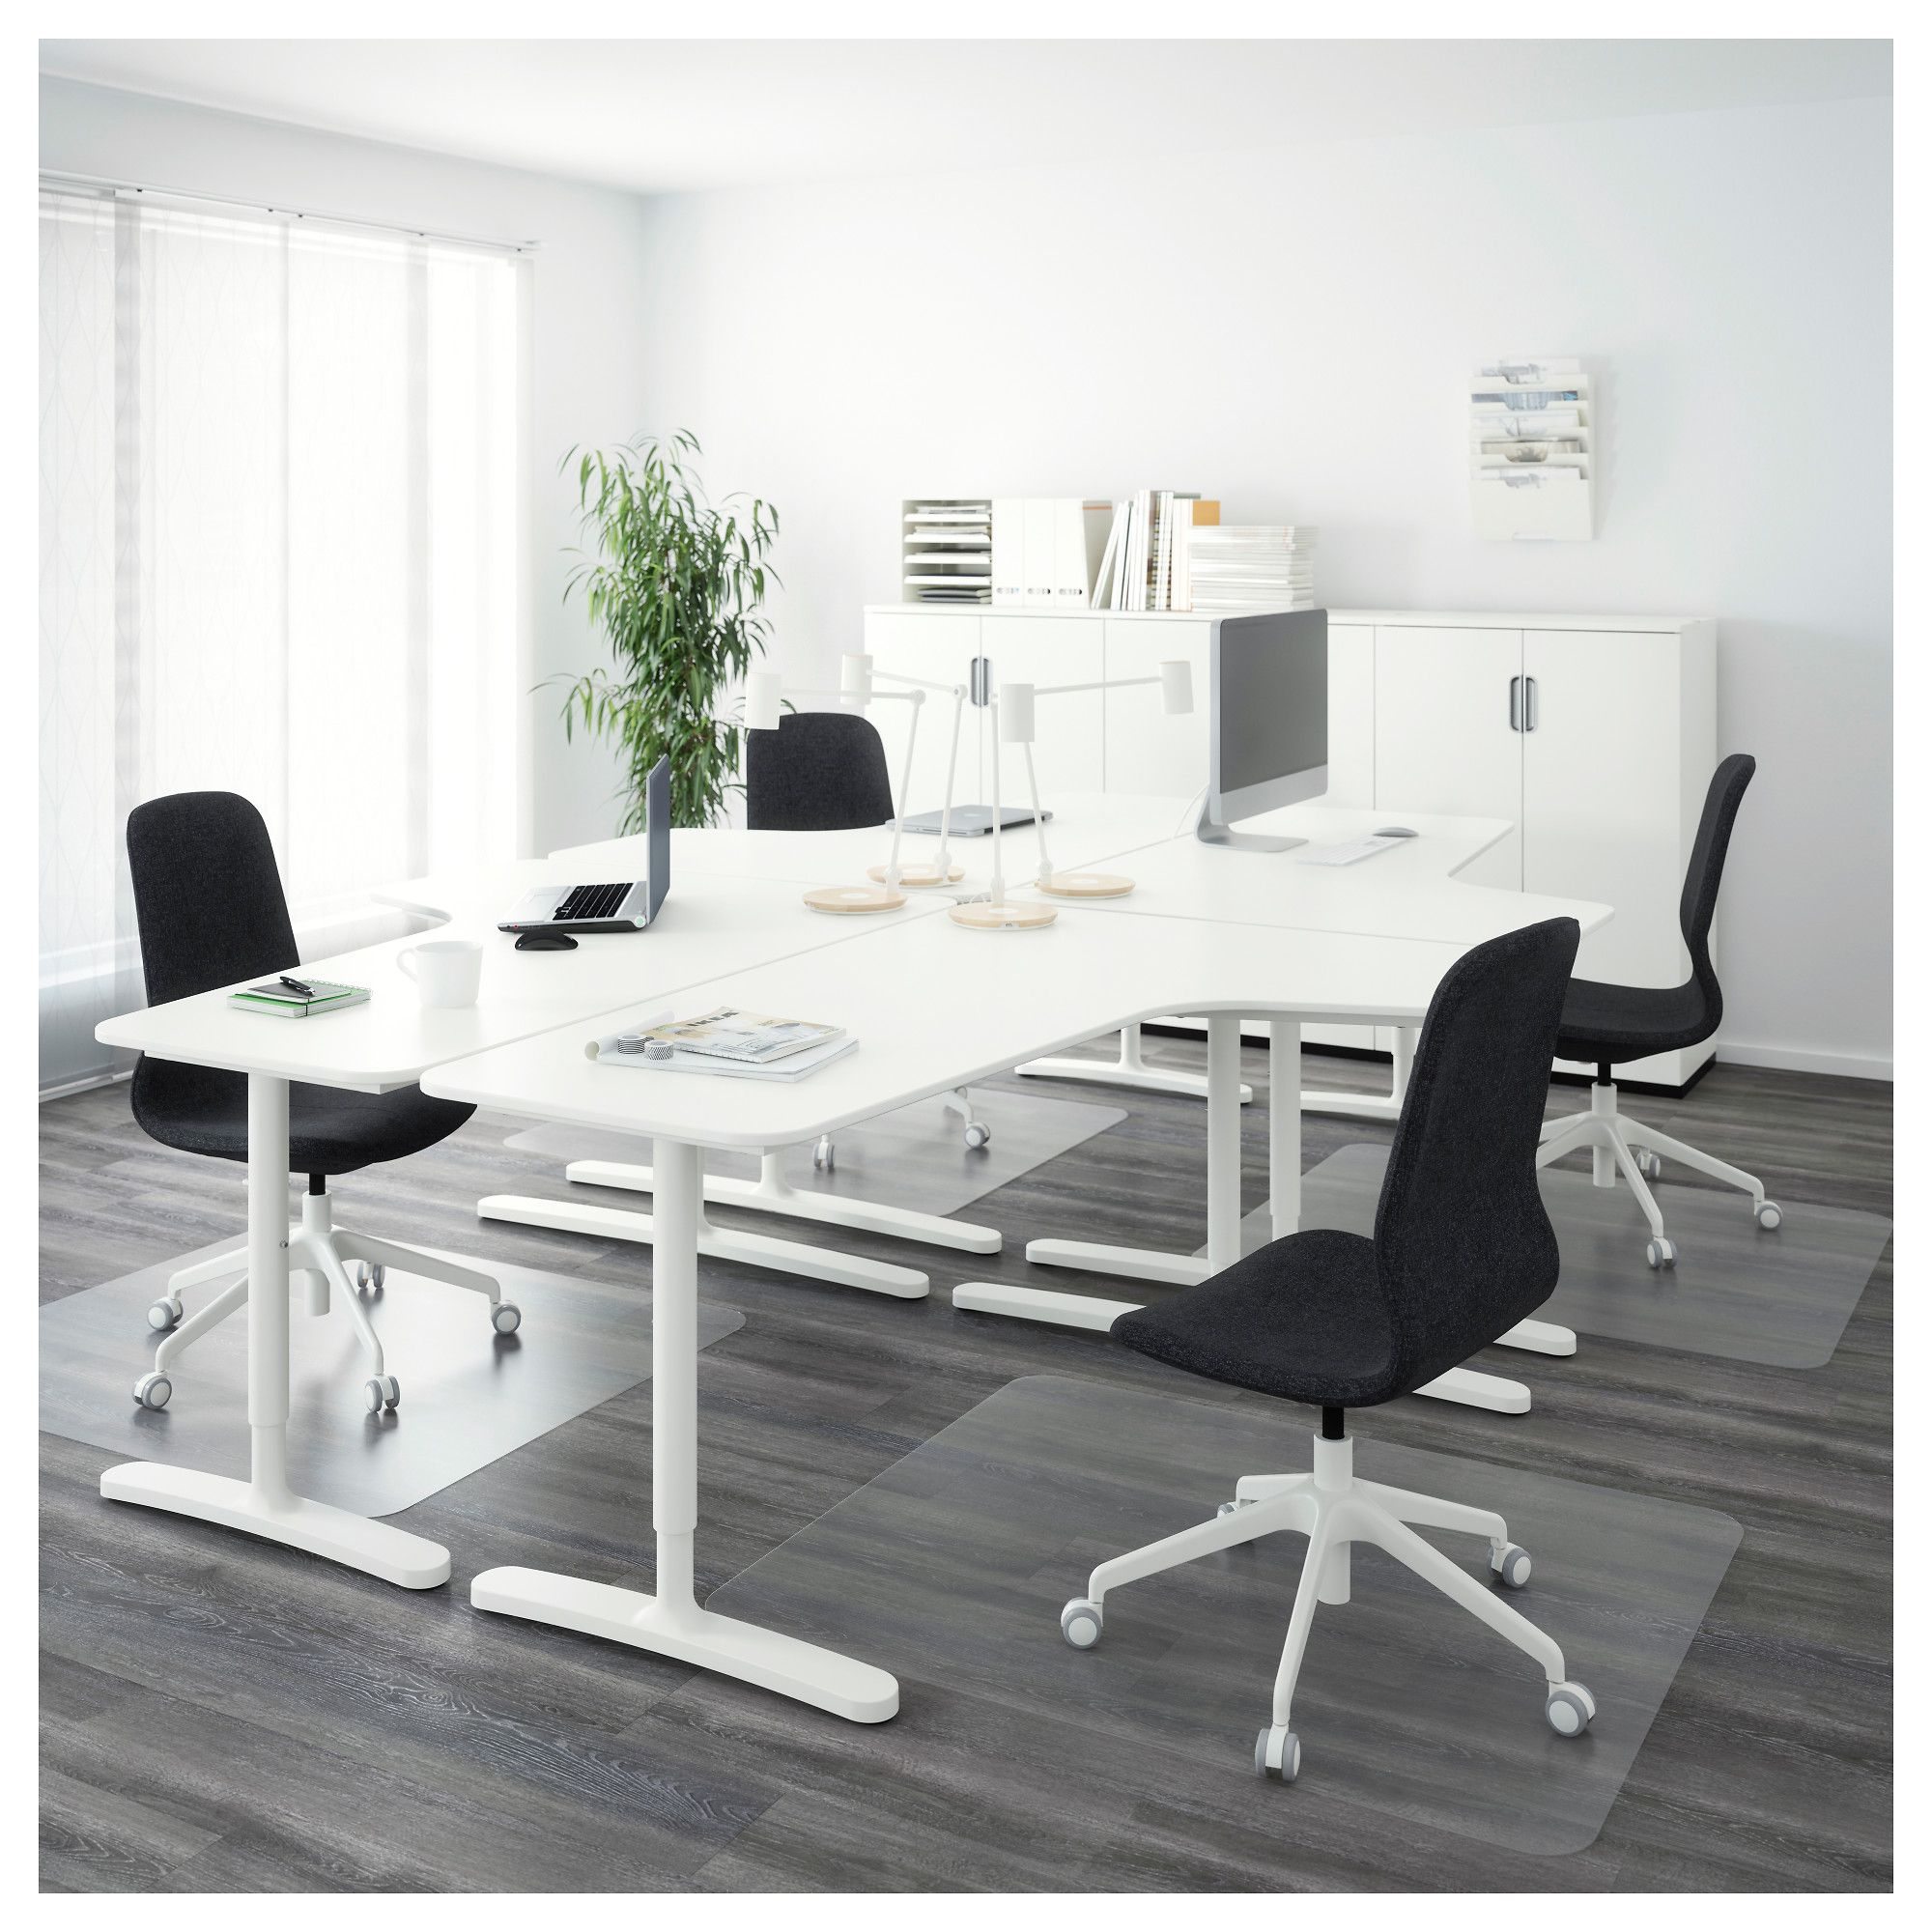 Bekant Desk Combination White Ikea Home Office Design Ikea Bekant Ikea Bekant Desk